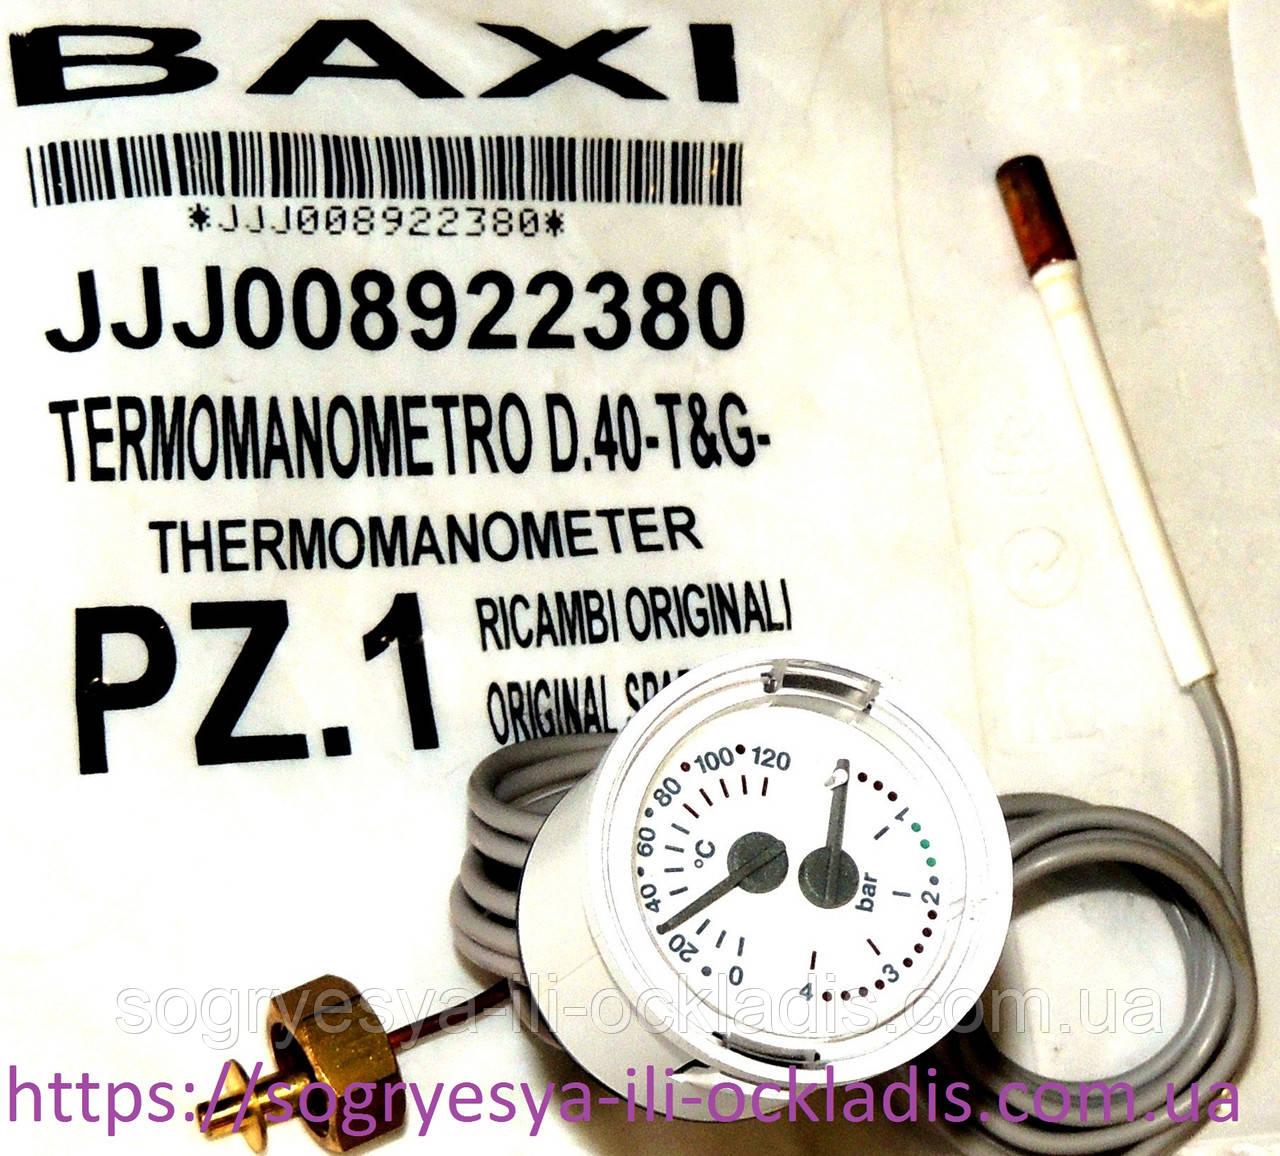 Термоманометр круглый 40 мм 0-4 bar 0-120 гр. (ф.у, EU) Baxi Eco, Western Energy, артикул 8922380, к.з. 0175